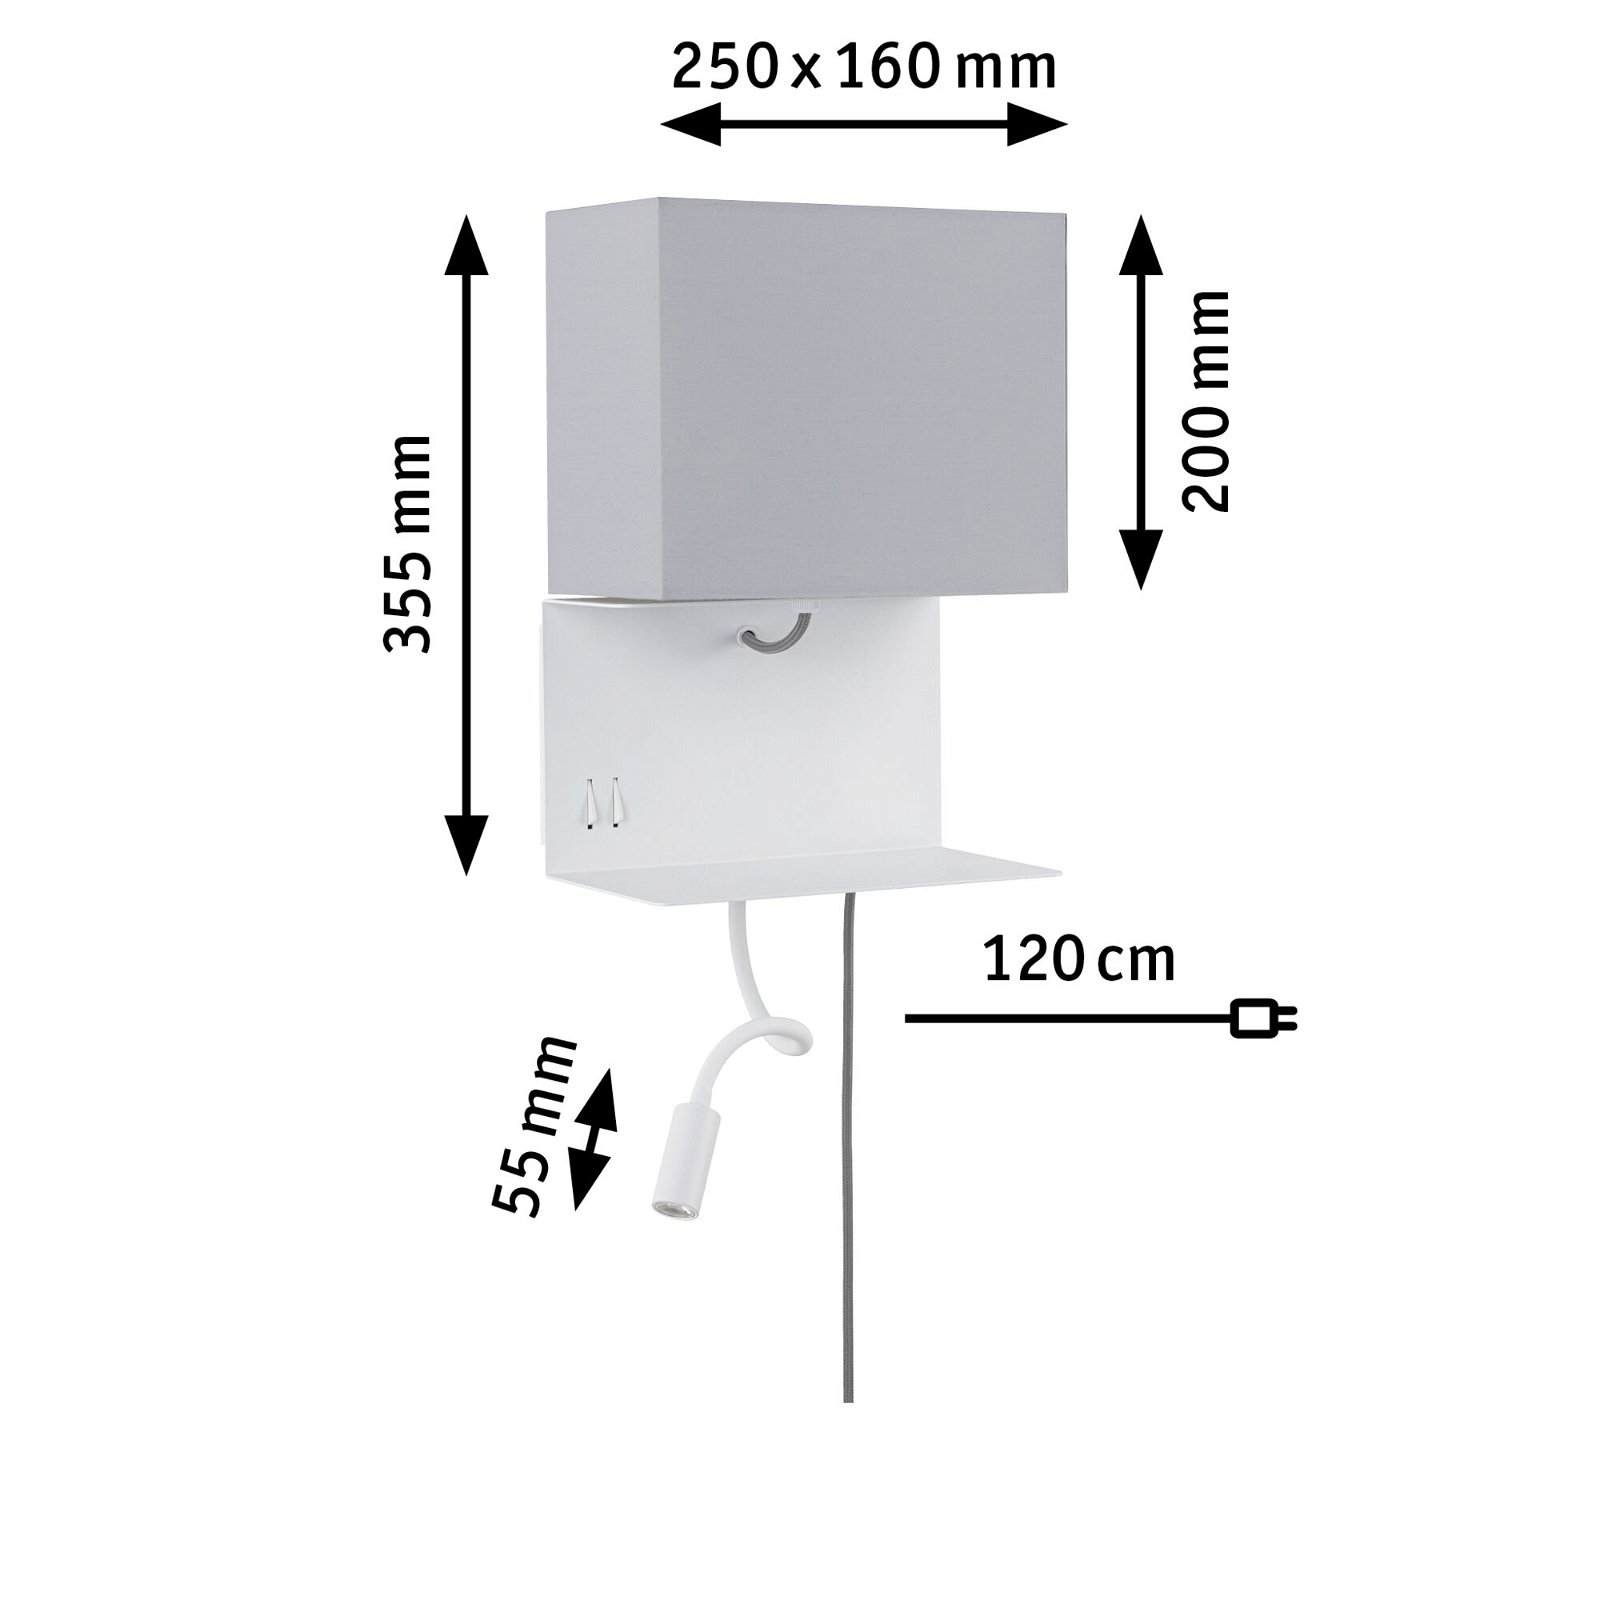 Wandleuchte mit Ablage Merani E27 3000K 140lm 230V 2,5W Grau/Weiß